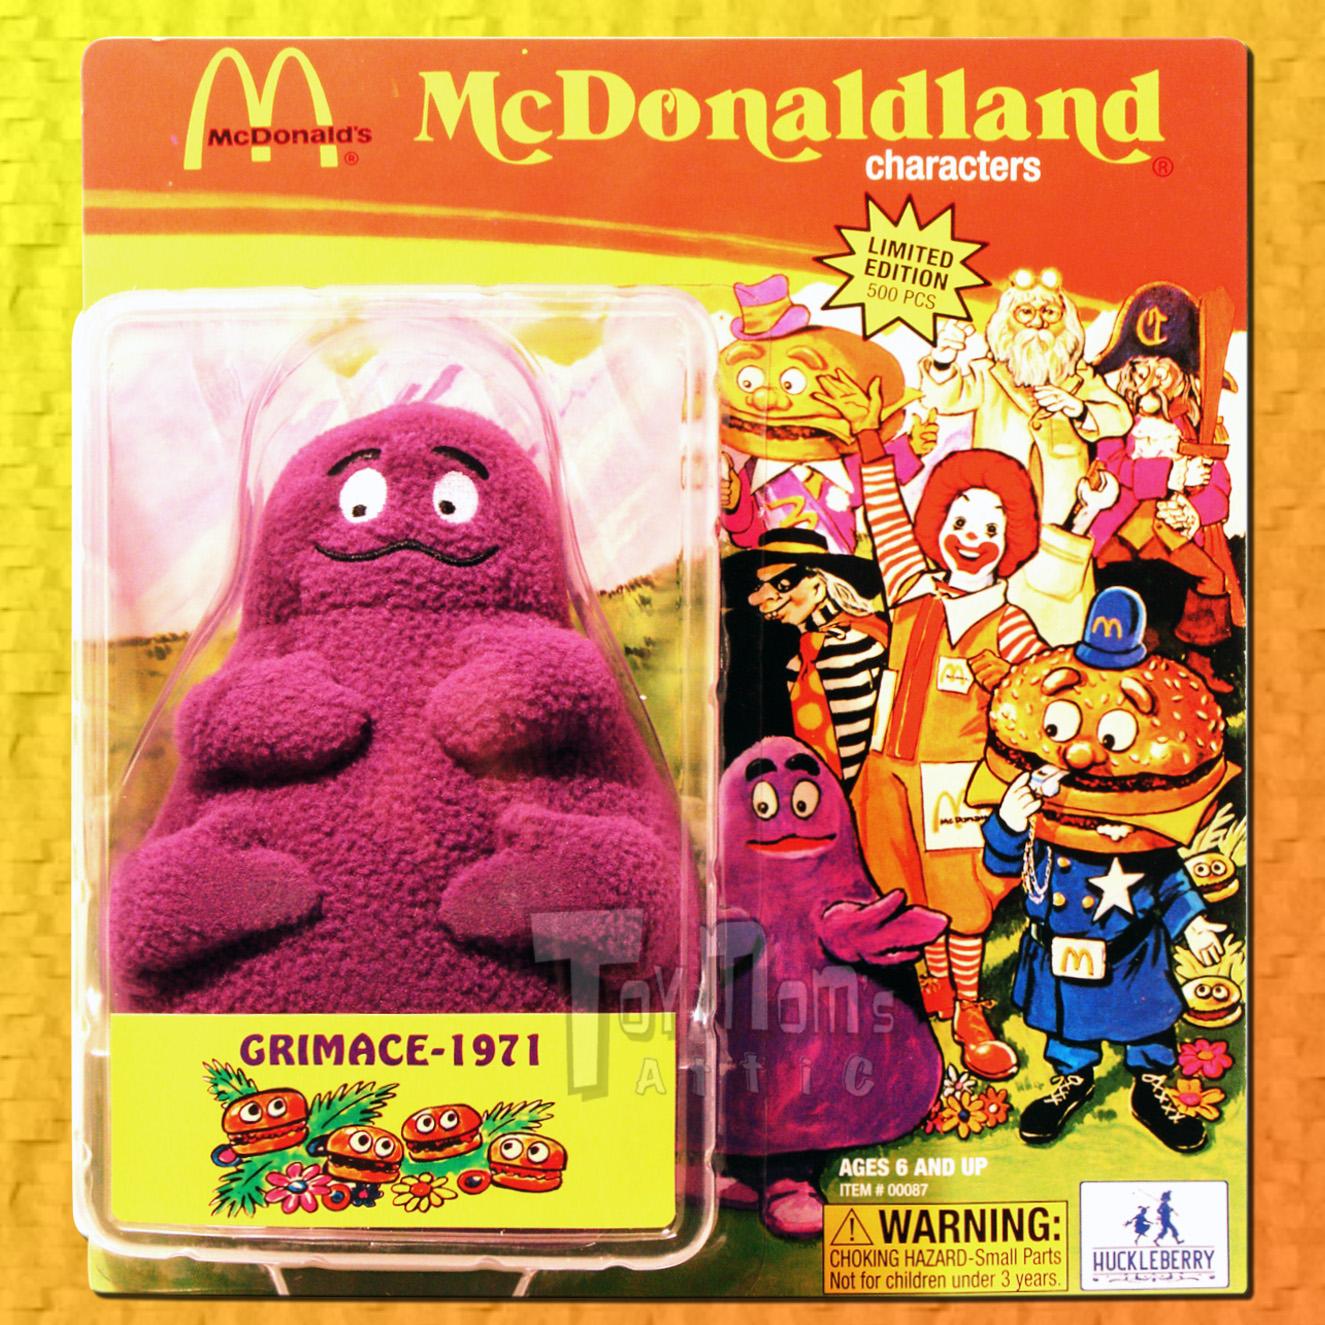 mcdonalds mcdonaldland 2007 sdcc exclusive 1971 grimace ebay